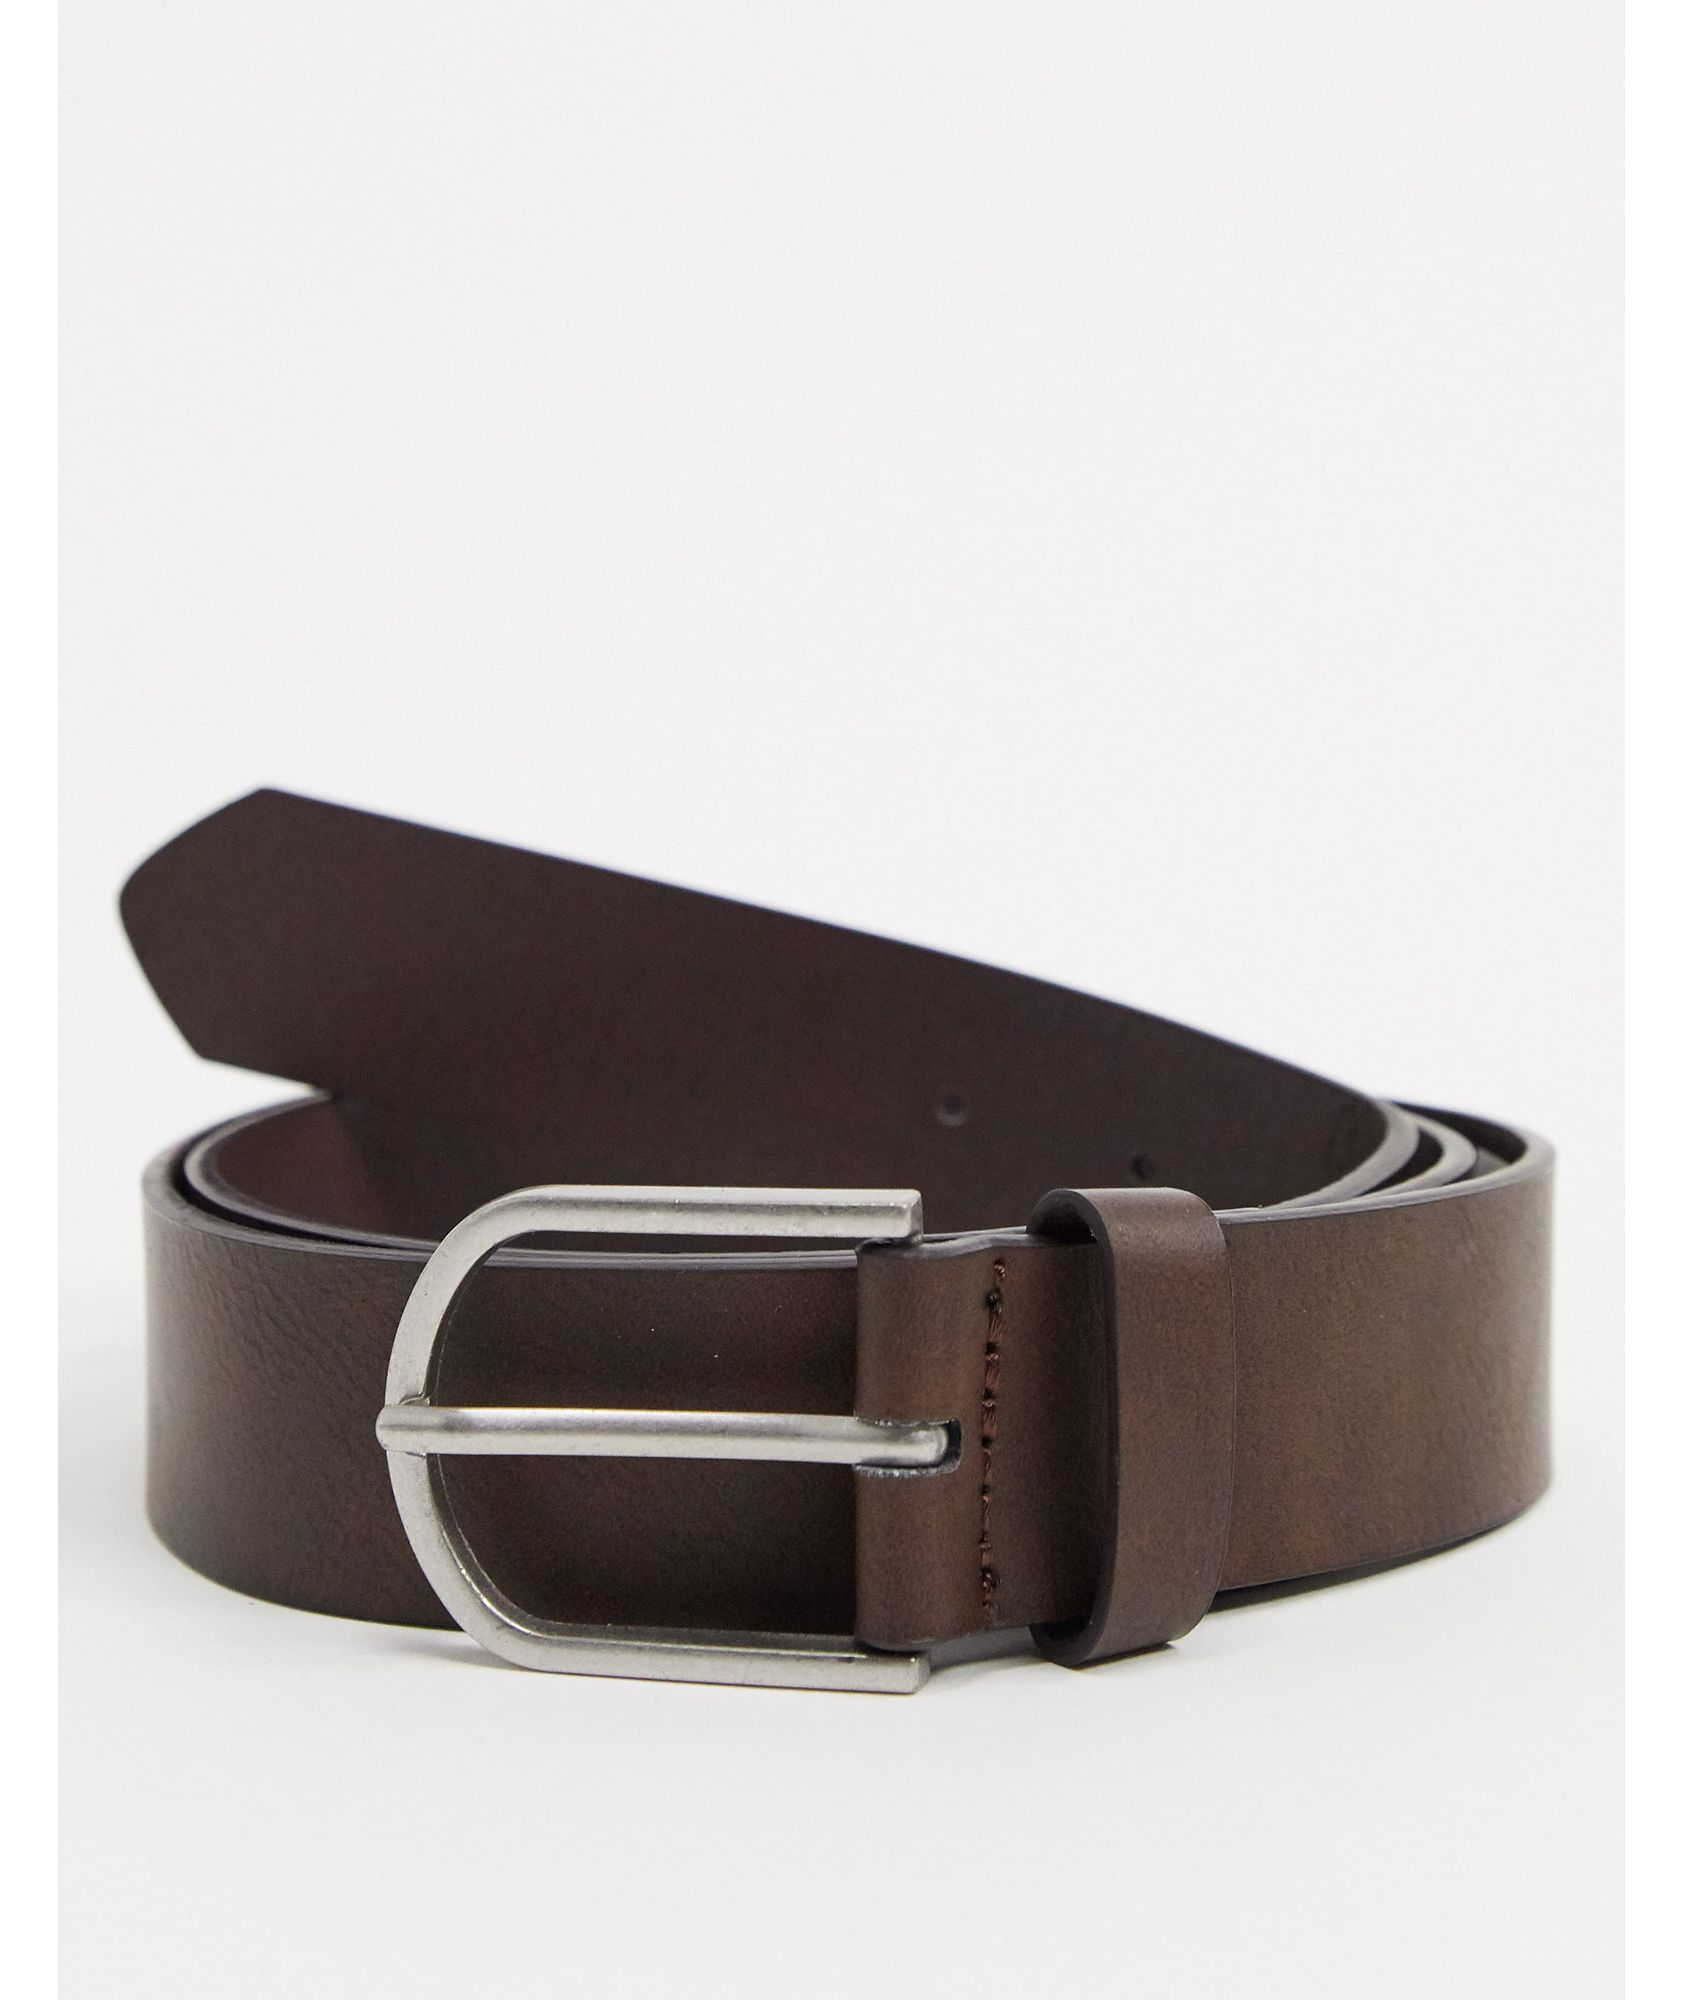 Bershka belt in dark brown - ASOS Price Checker